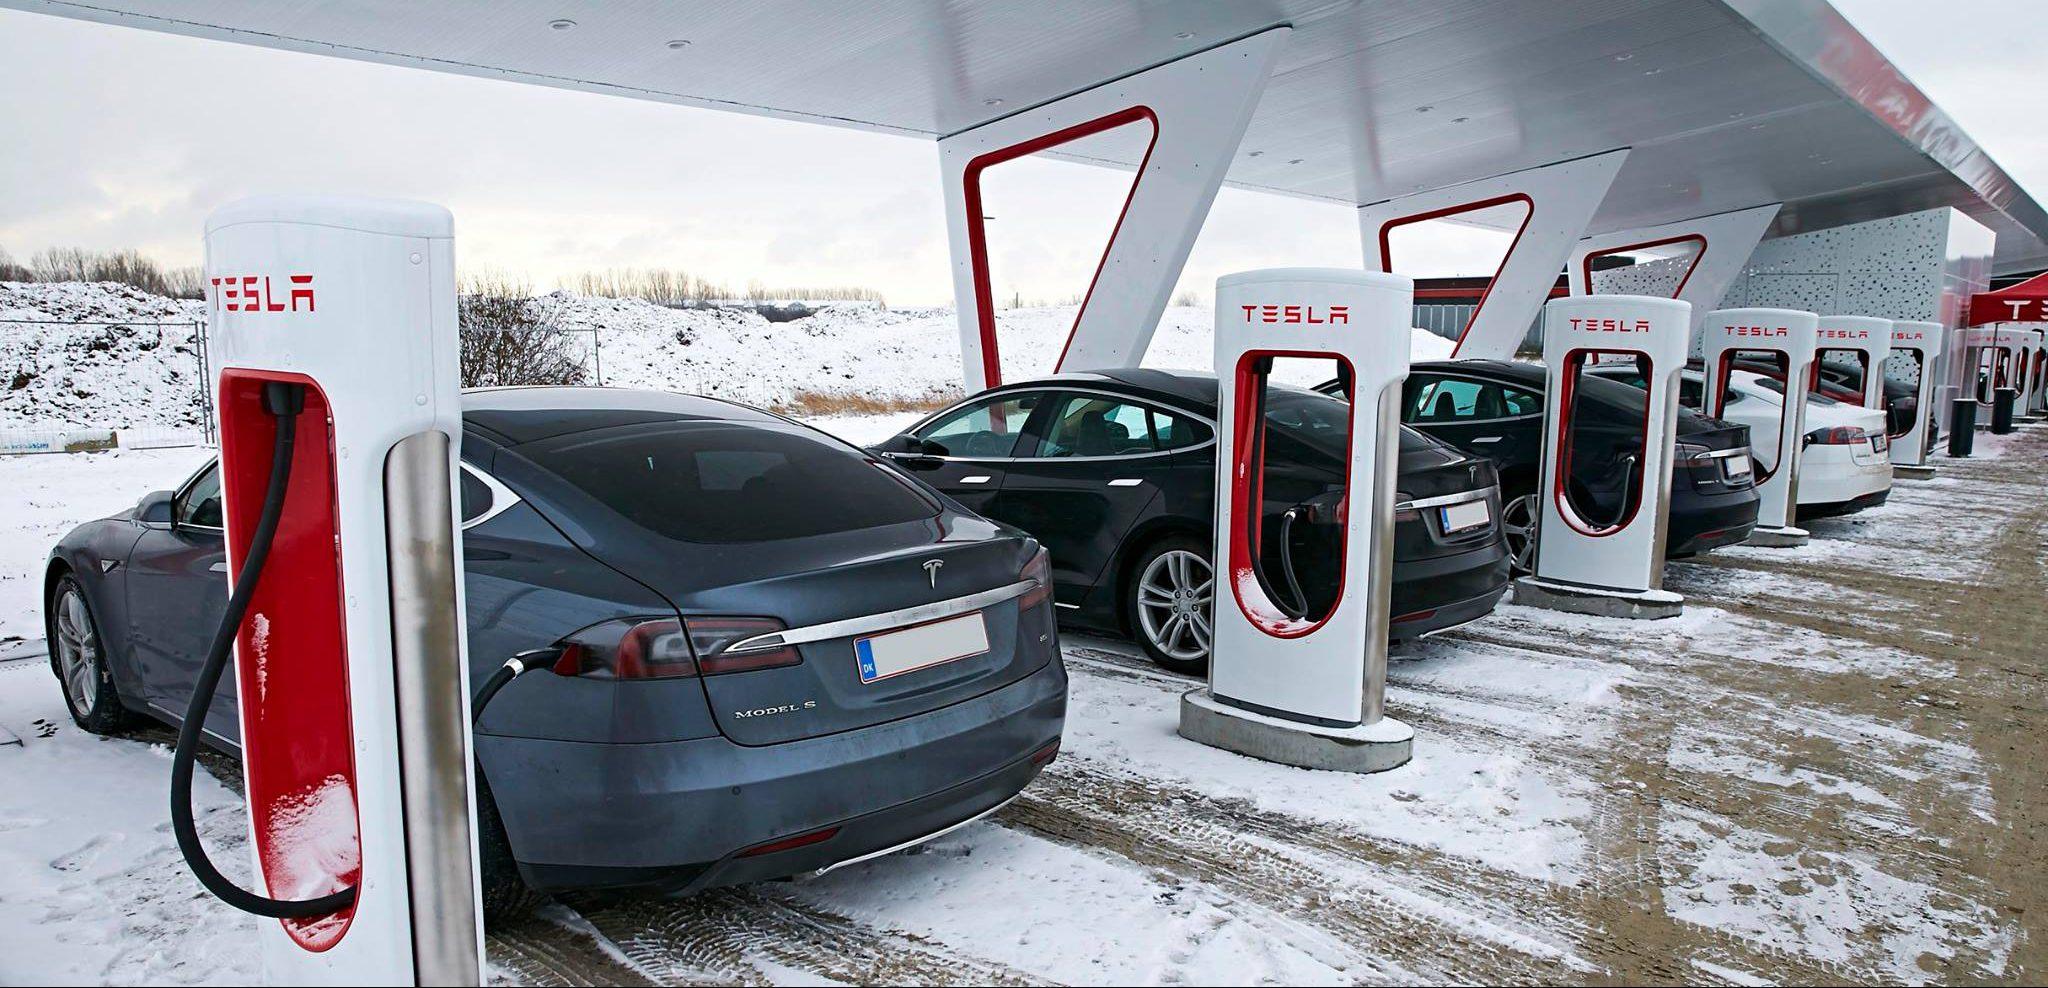 Tesla_SuperchargingStation_balkans